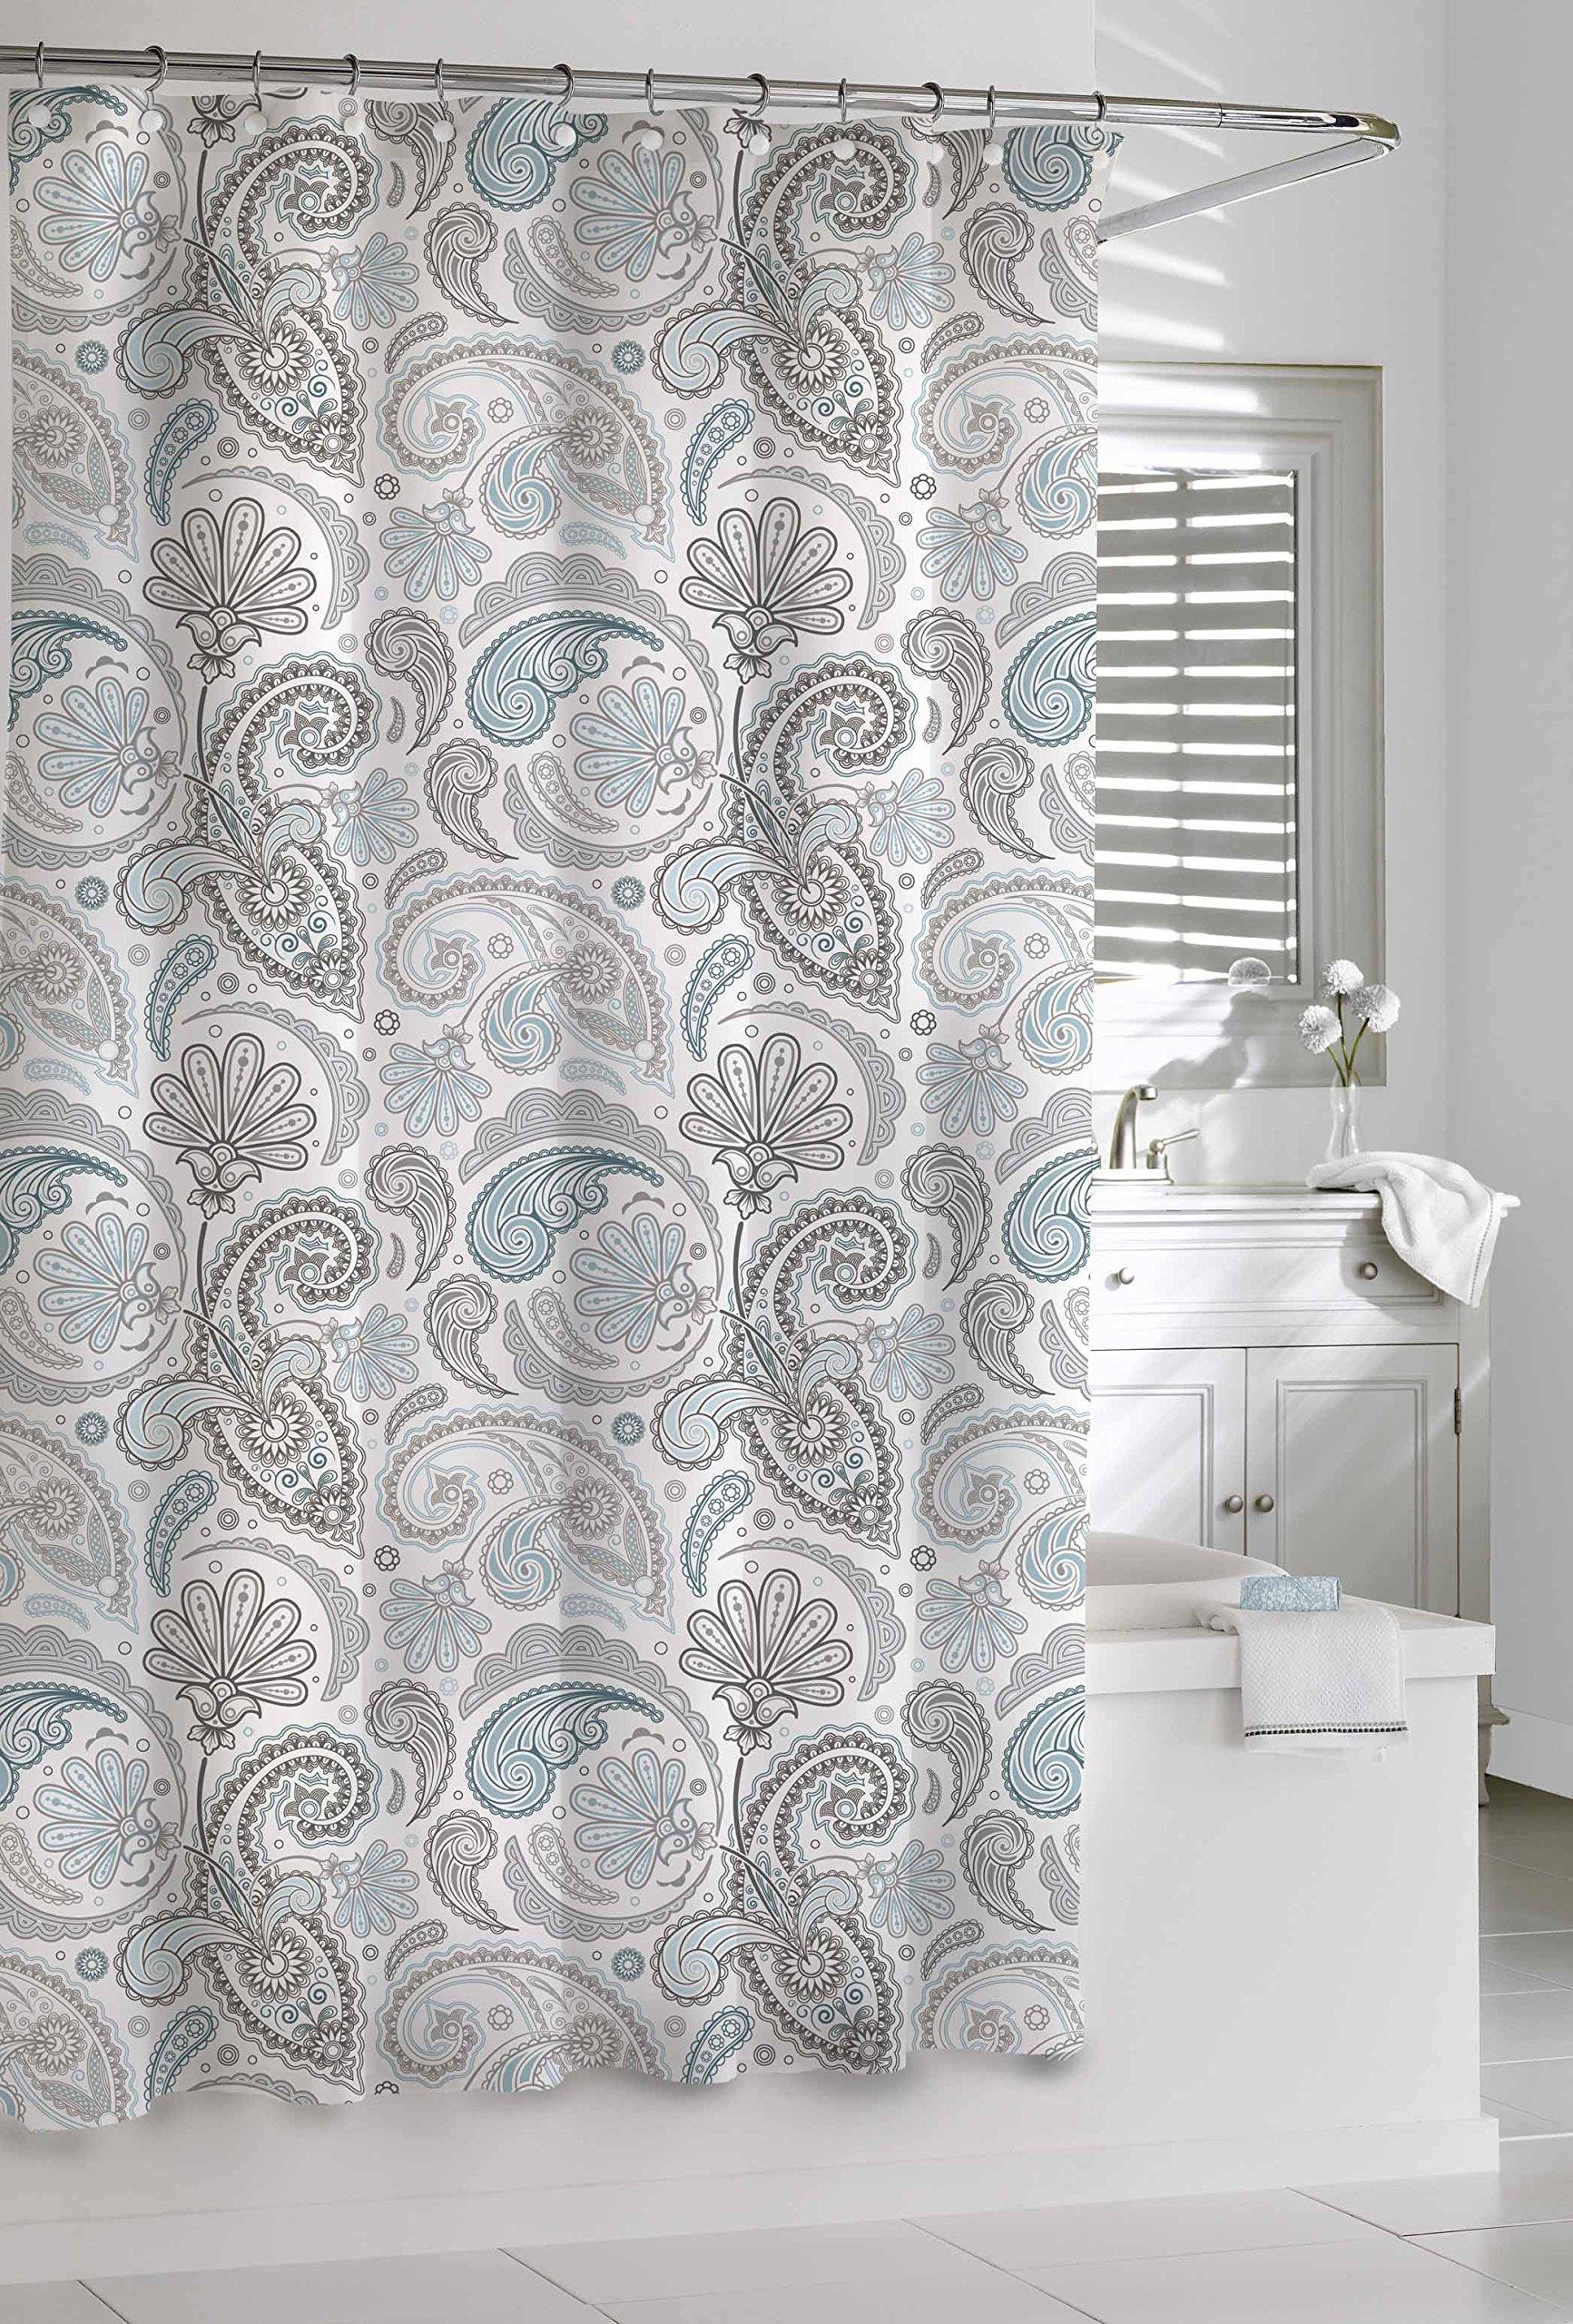 Kassatex SPS-115-BGR Paisley Shower Curtain, Blue/Grey, 72 by 72-Inch - 100% cotton Machine wash Cold, tumble dry low Do not bleach - shower-curtains, bathroom-linens, bathroom - A1Z17R1ifYL -